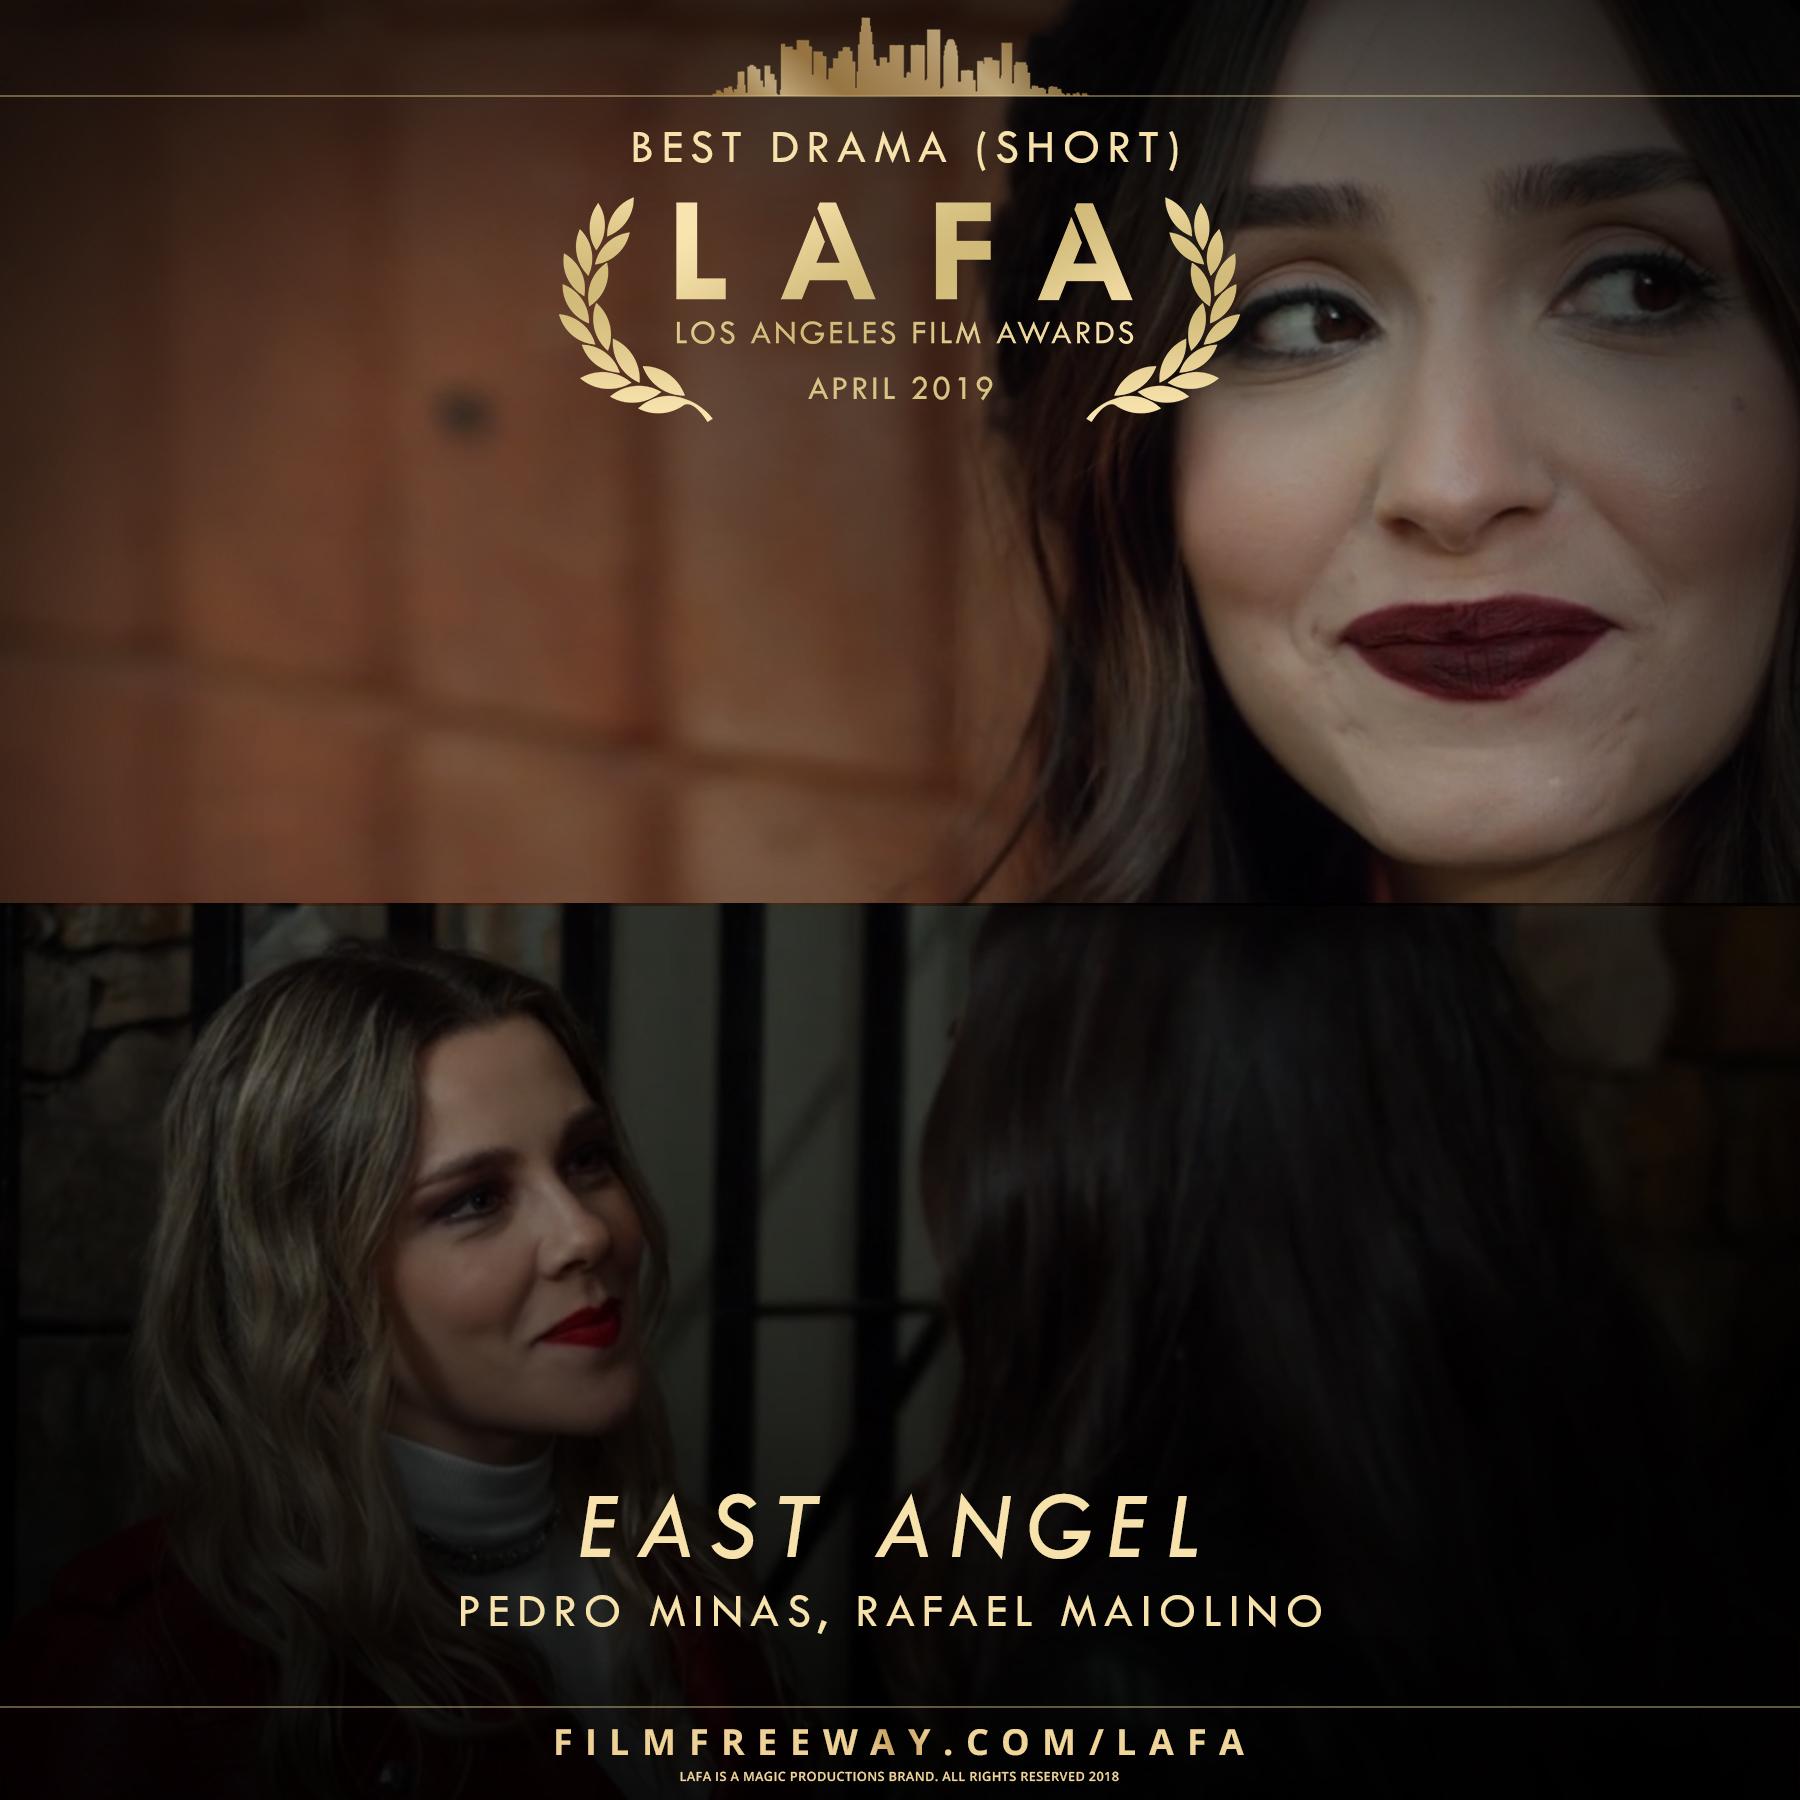 East Angel design